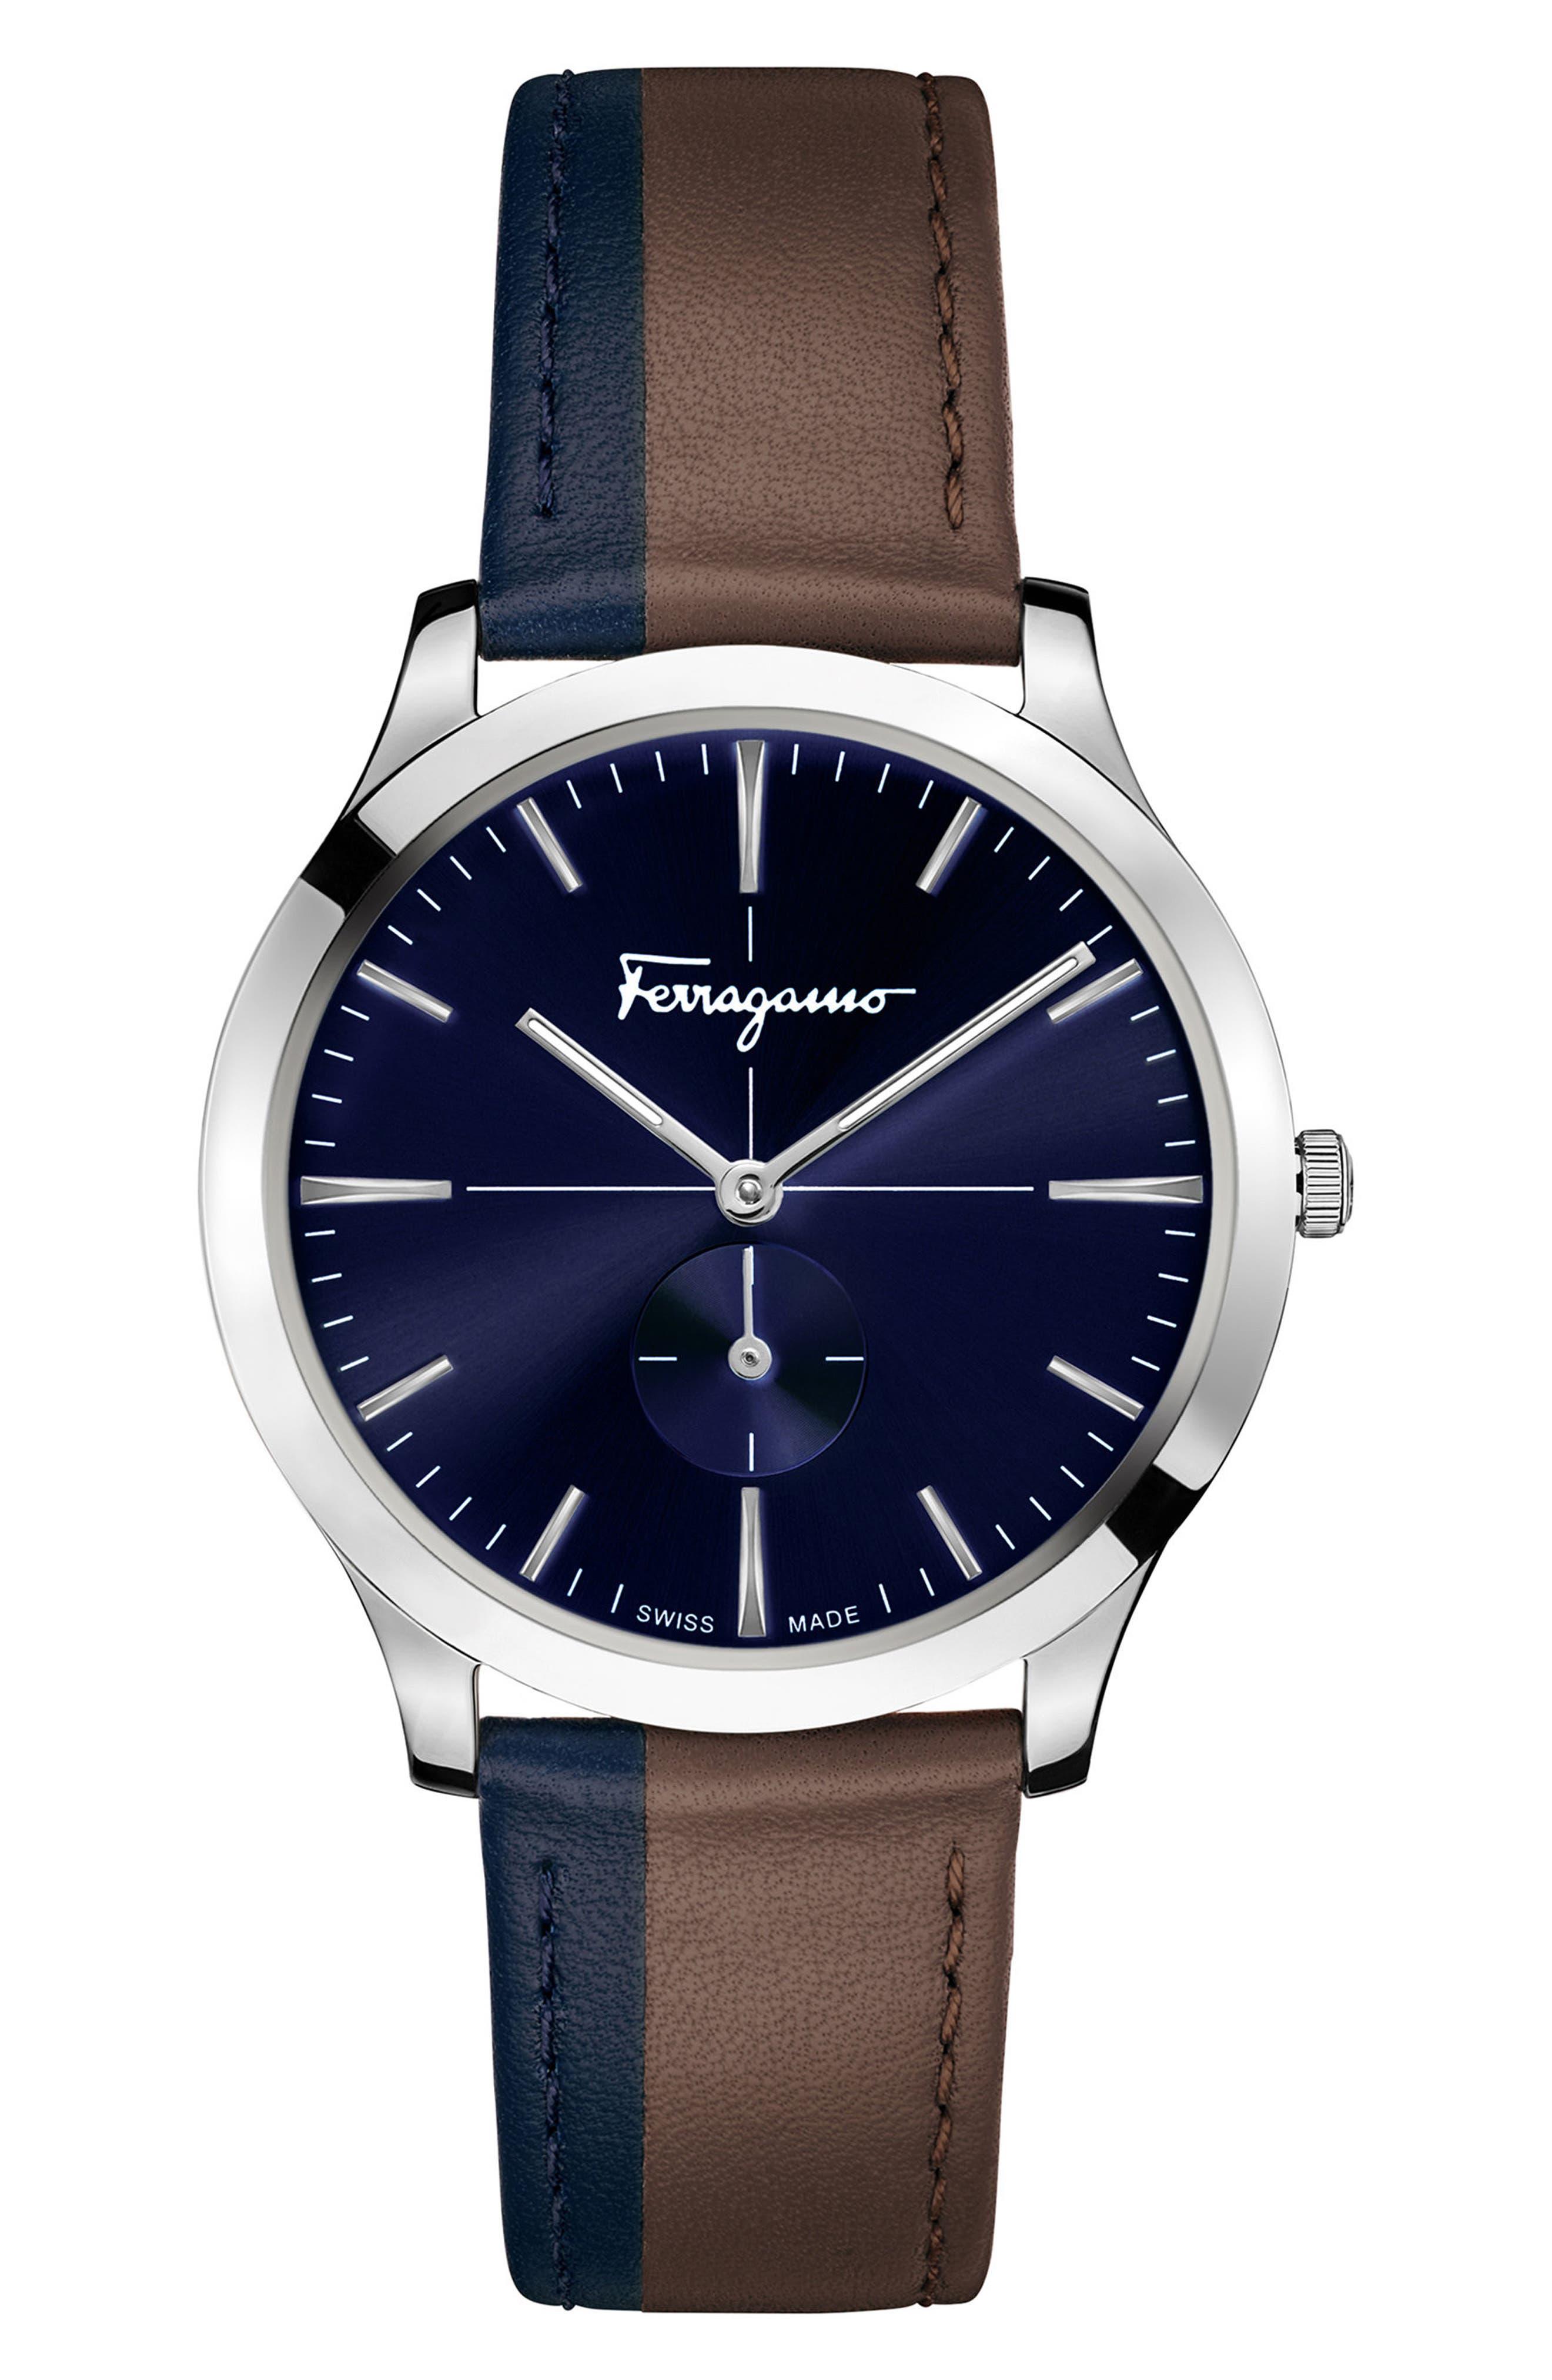 SALVATORE FERRAGAMO Slim Formal Leather Strap Watch, 40mm, Main, color, 200